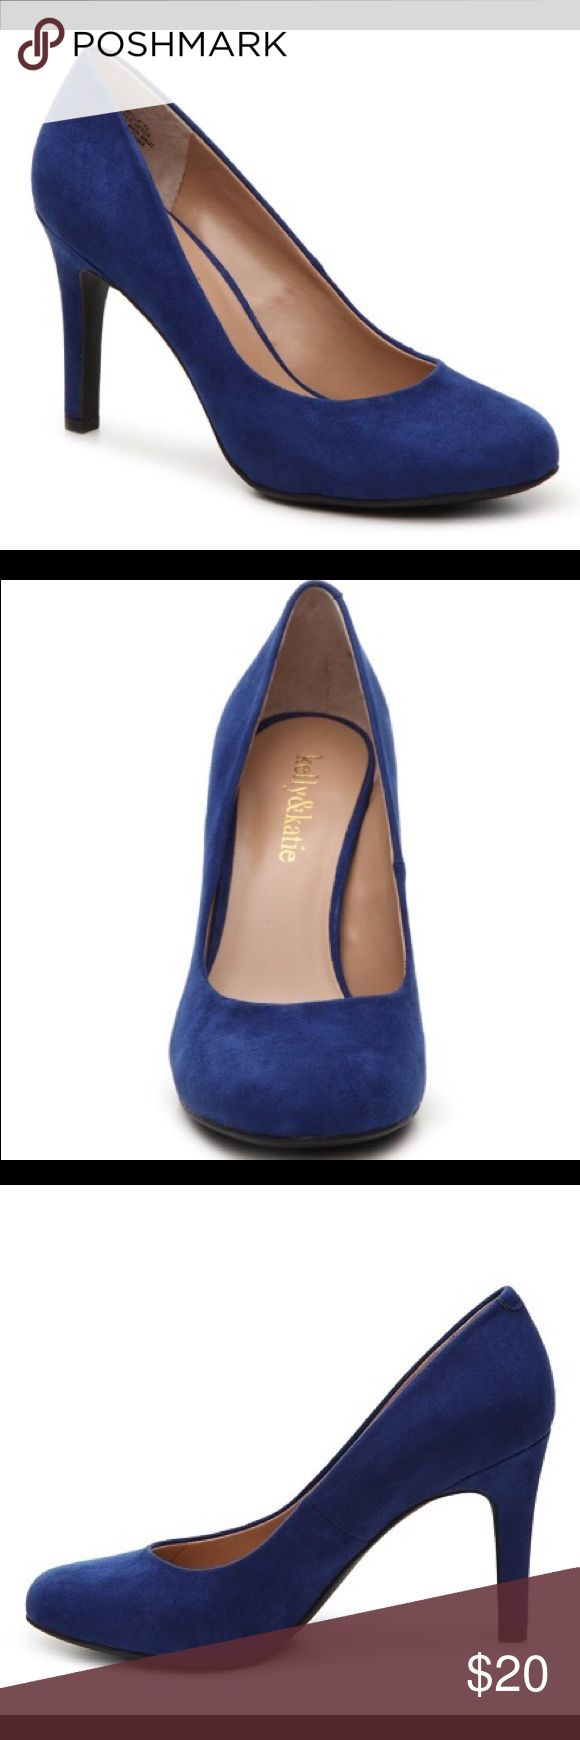 New   Kelly & Katie   Blue Suede Pumps   Size 6 Brand new cobalt blue Suede Pumps. Will trade. Kelly & Katie Shoes Heels